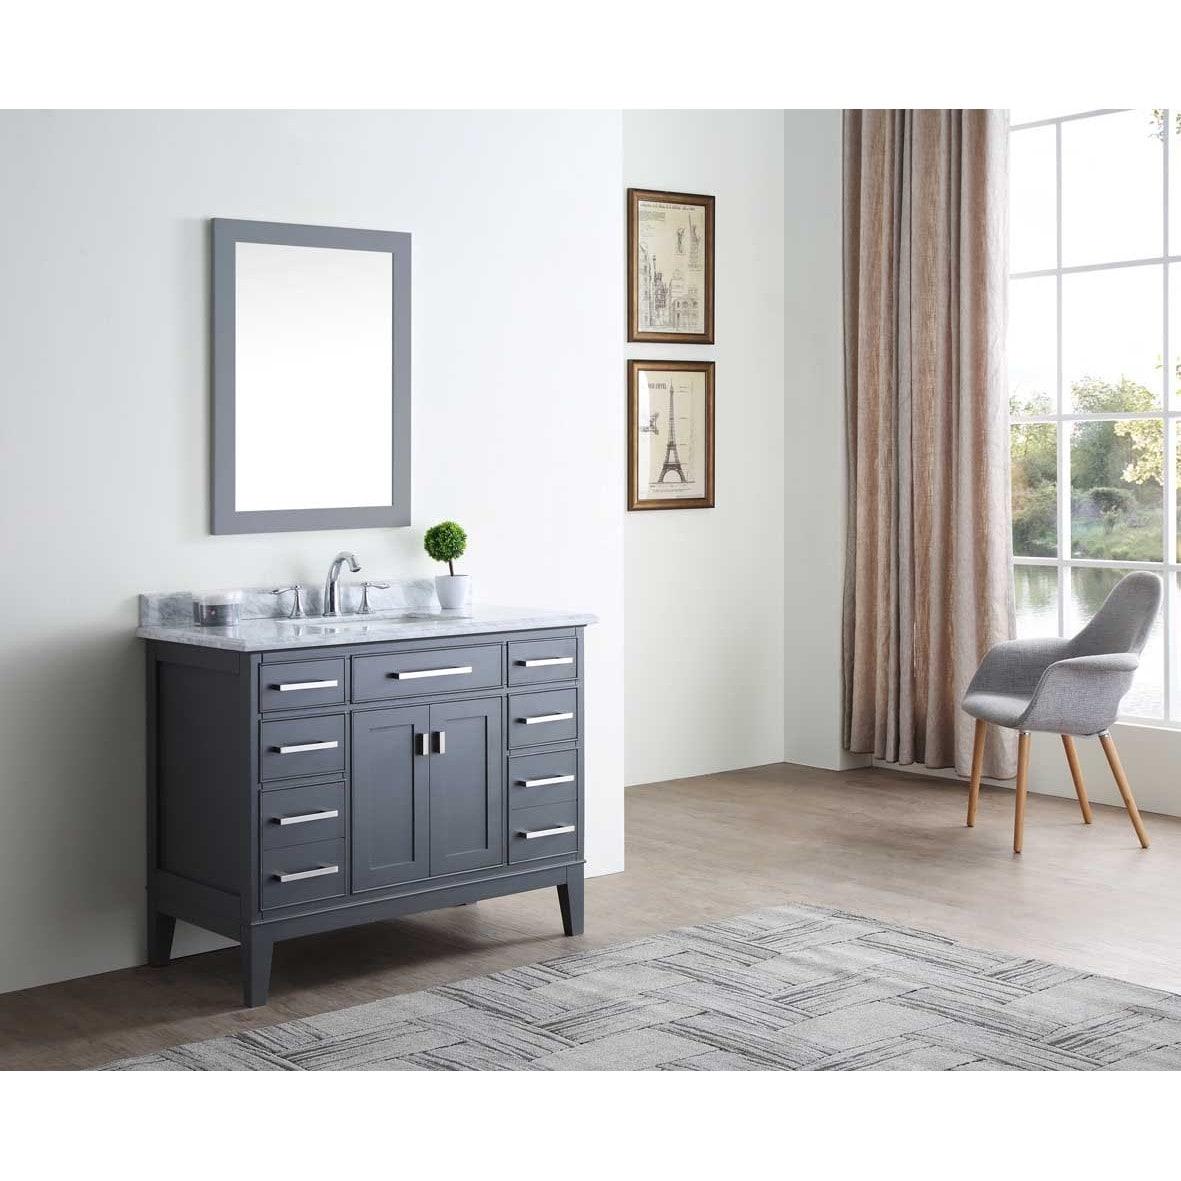 Danny Maple Grey 42-inch Single Bathroom Vanity Set - Free Shipping ...